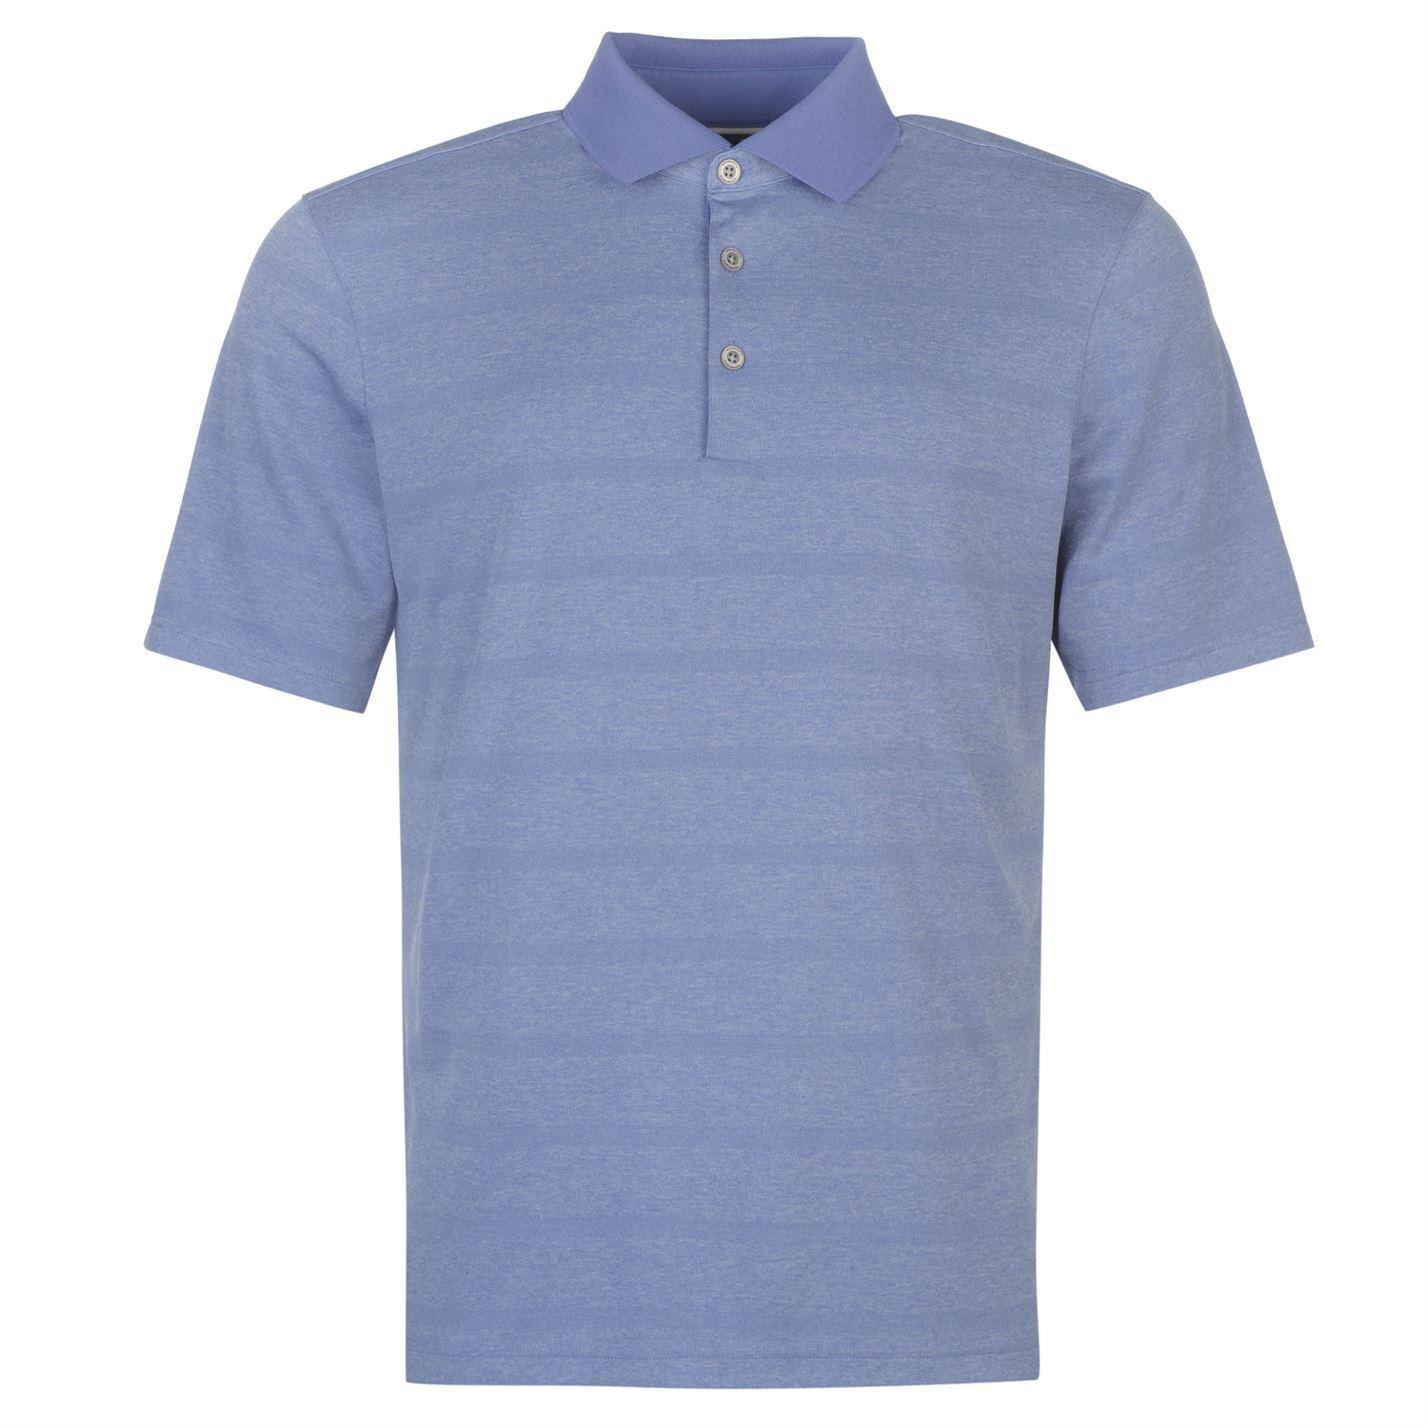 Ashworth-Mens-Knit-Polo-Shirt-Short-Sleeve-Performance-